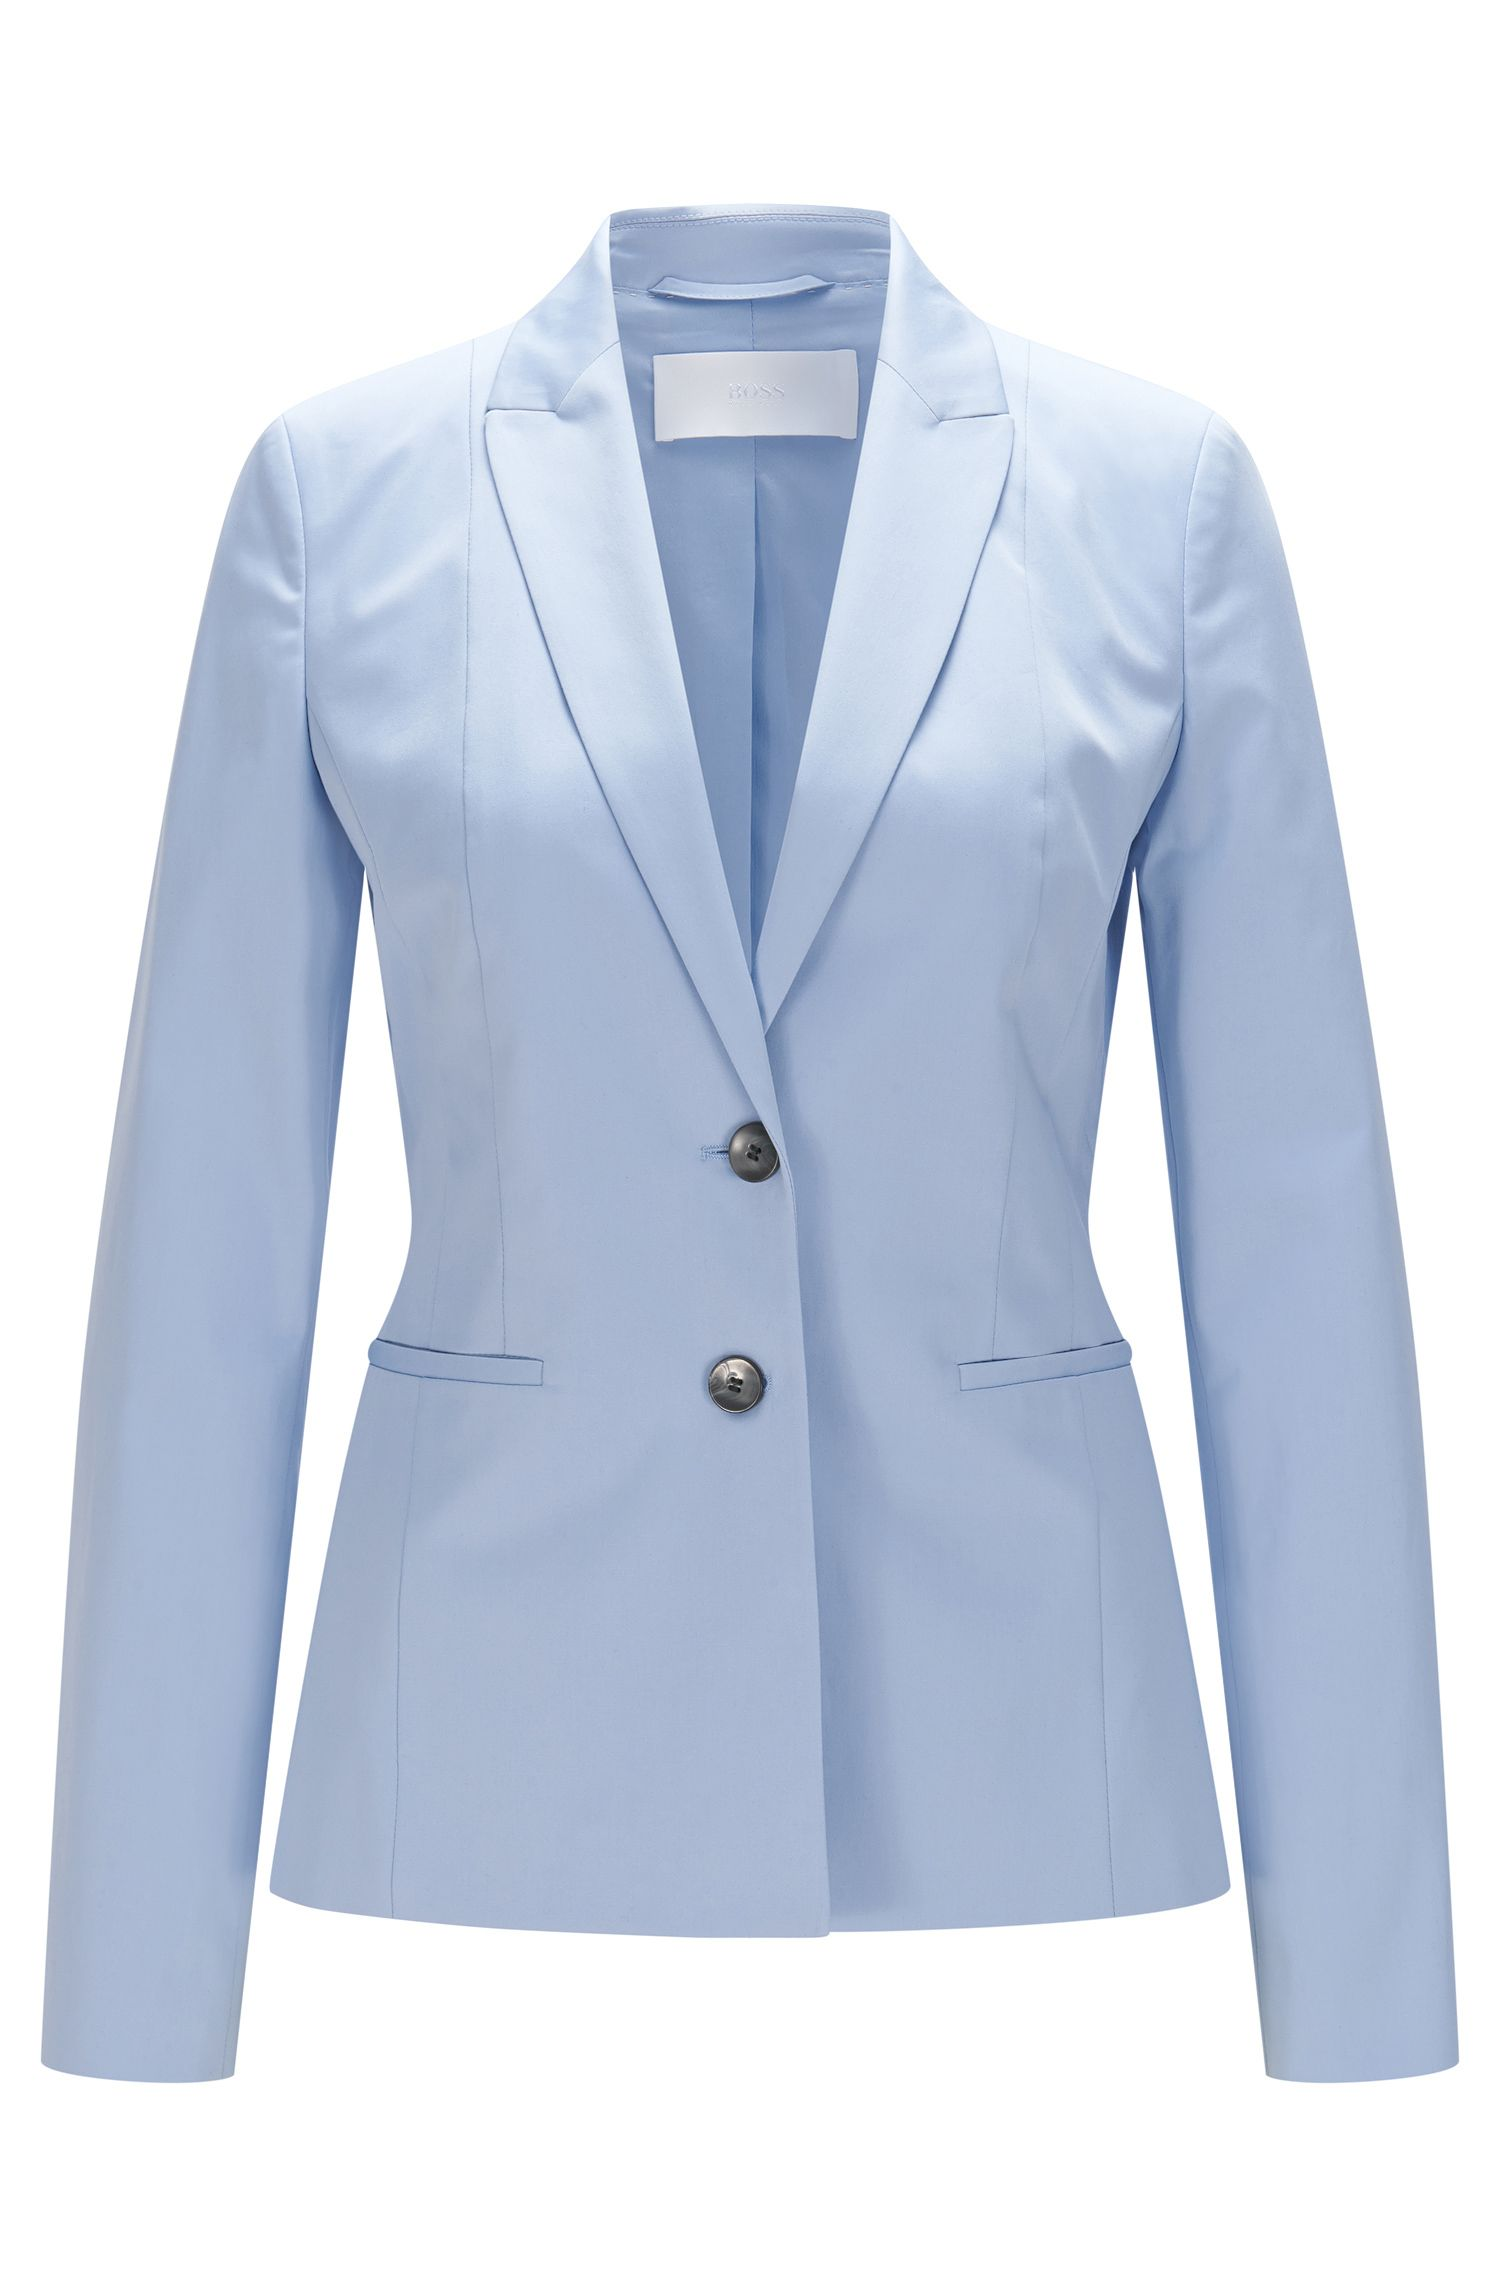 'Jelany' | Tailored Stretch Cotton Blazer